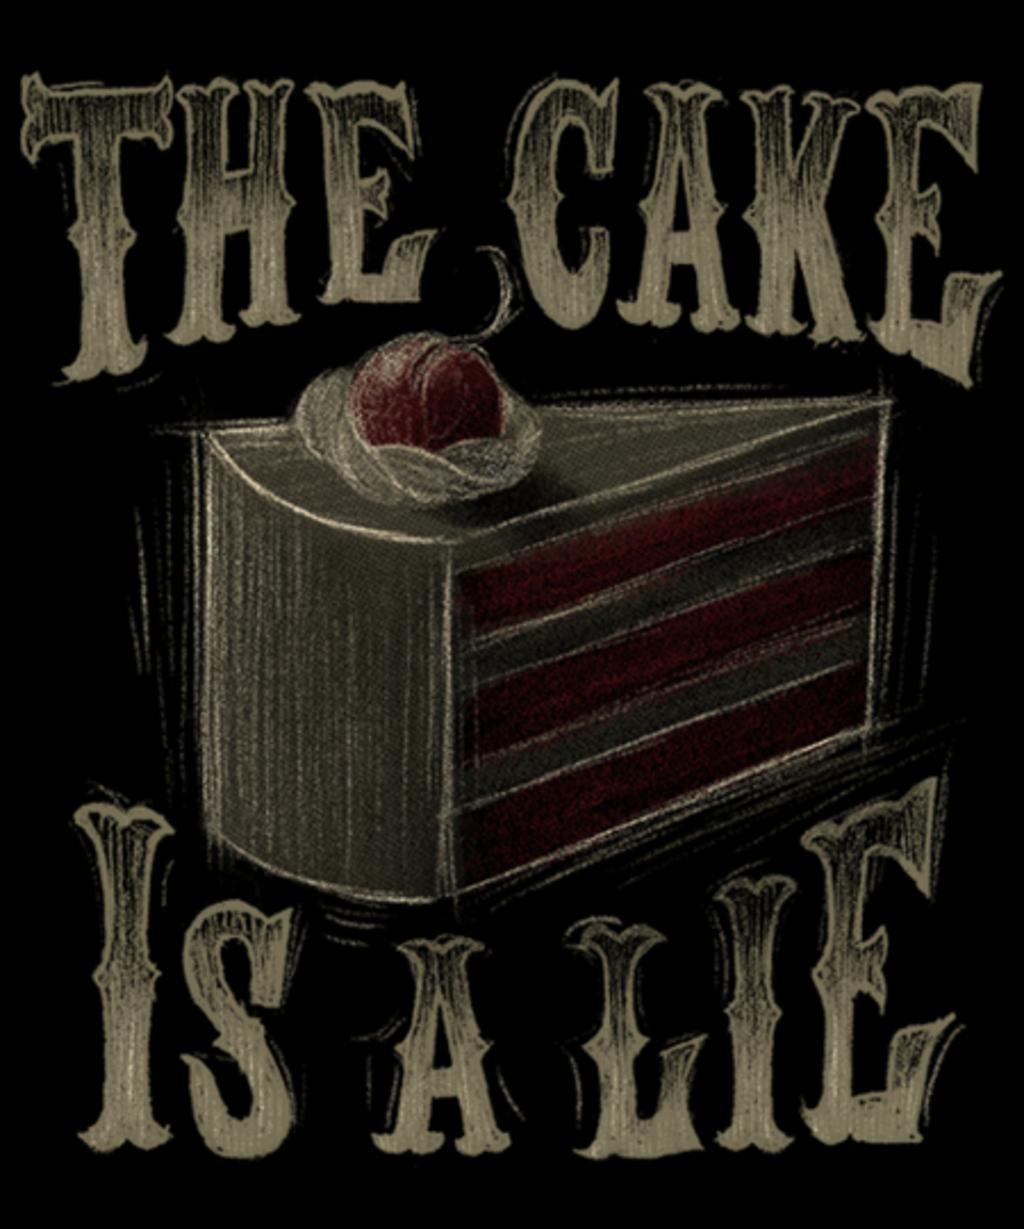 Qwertee: The cake is a lie